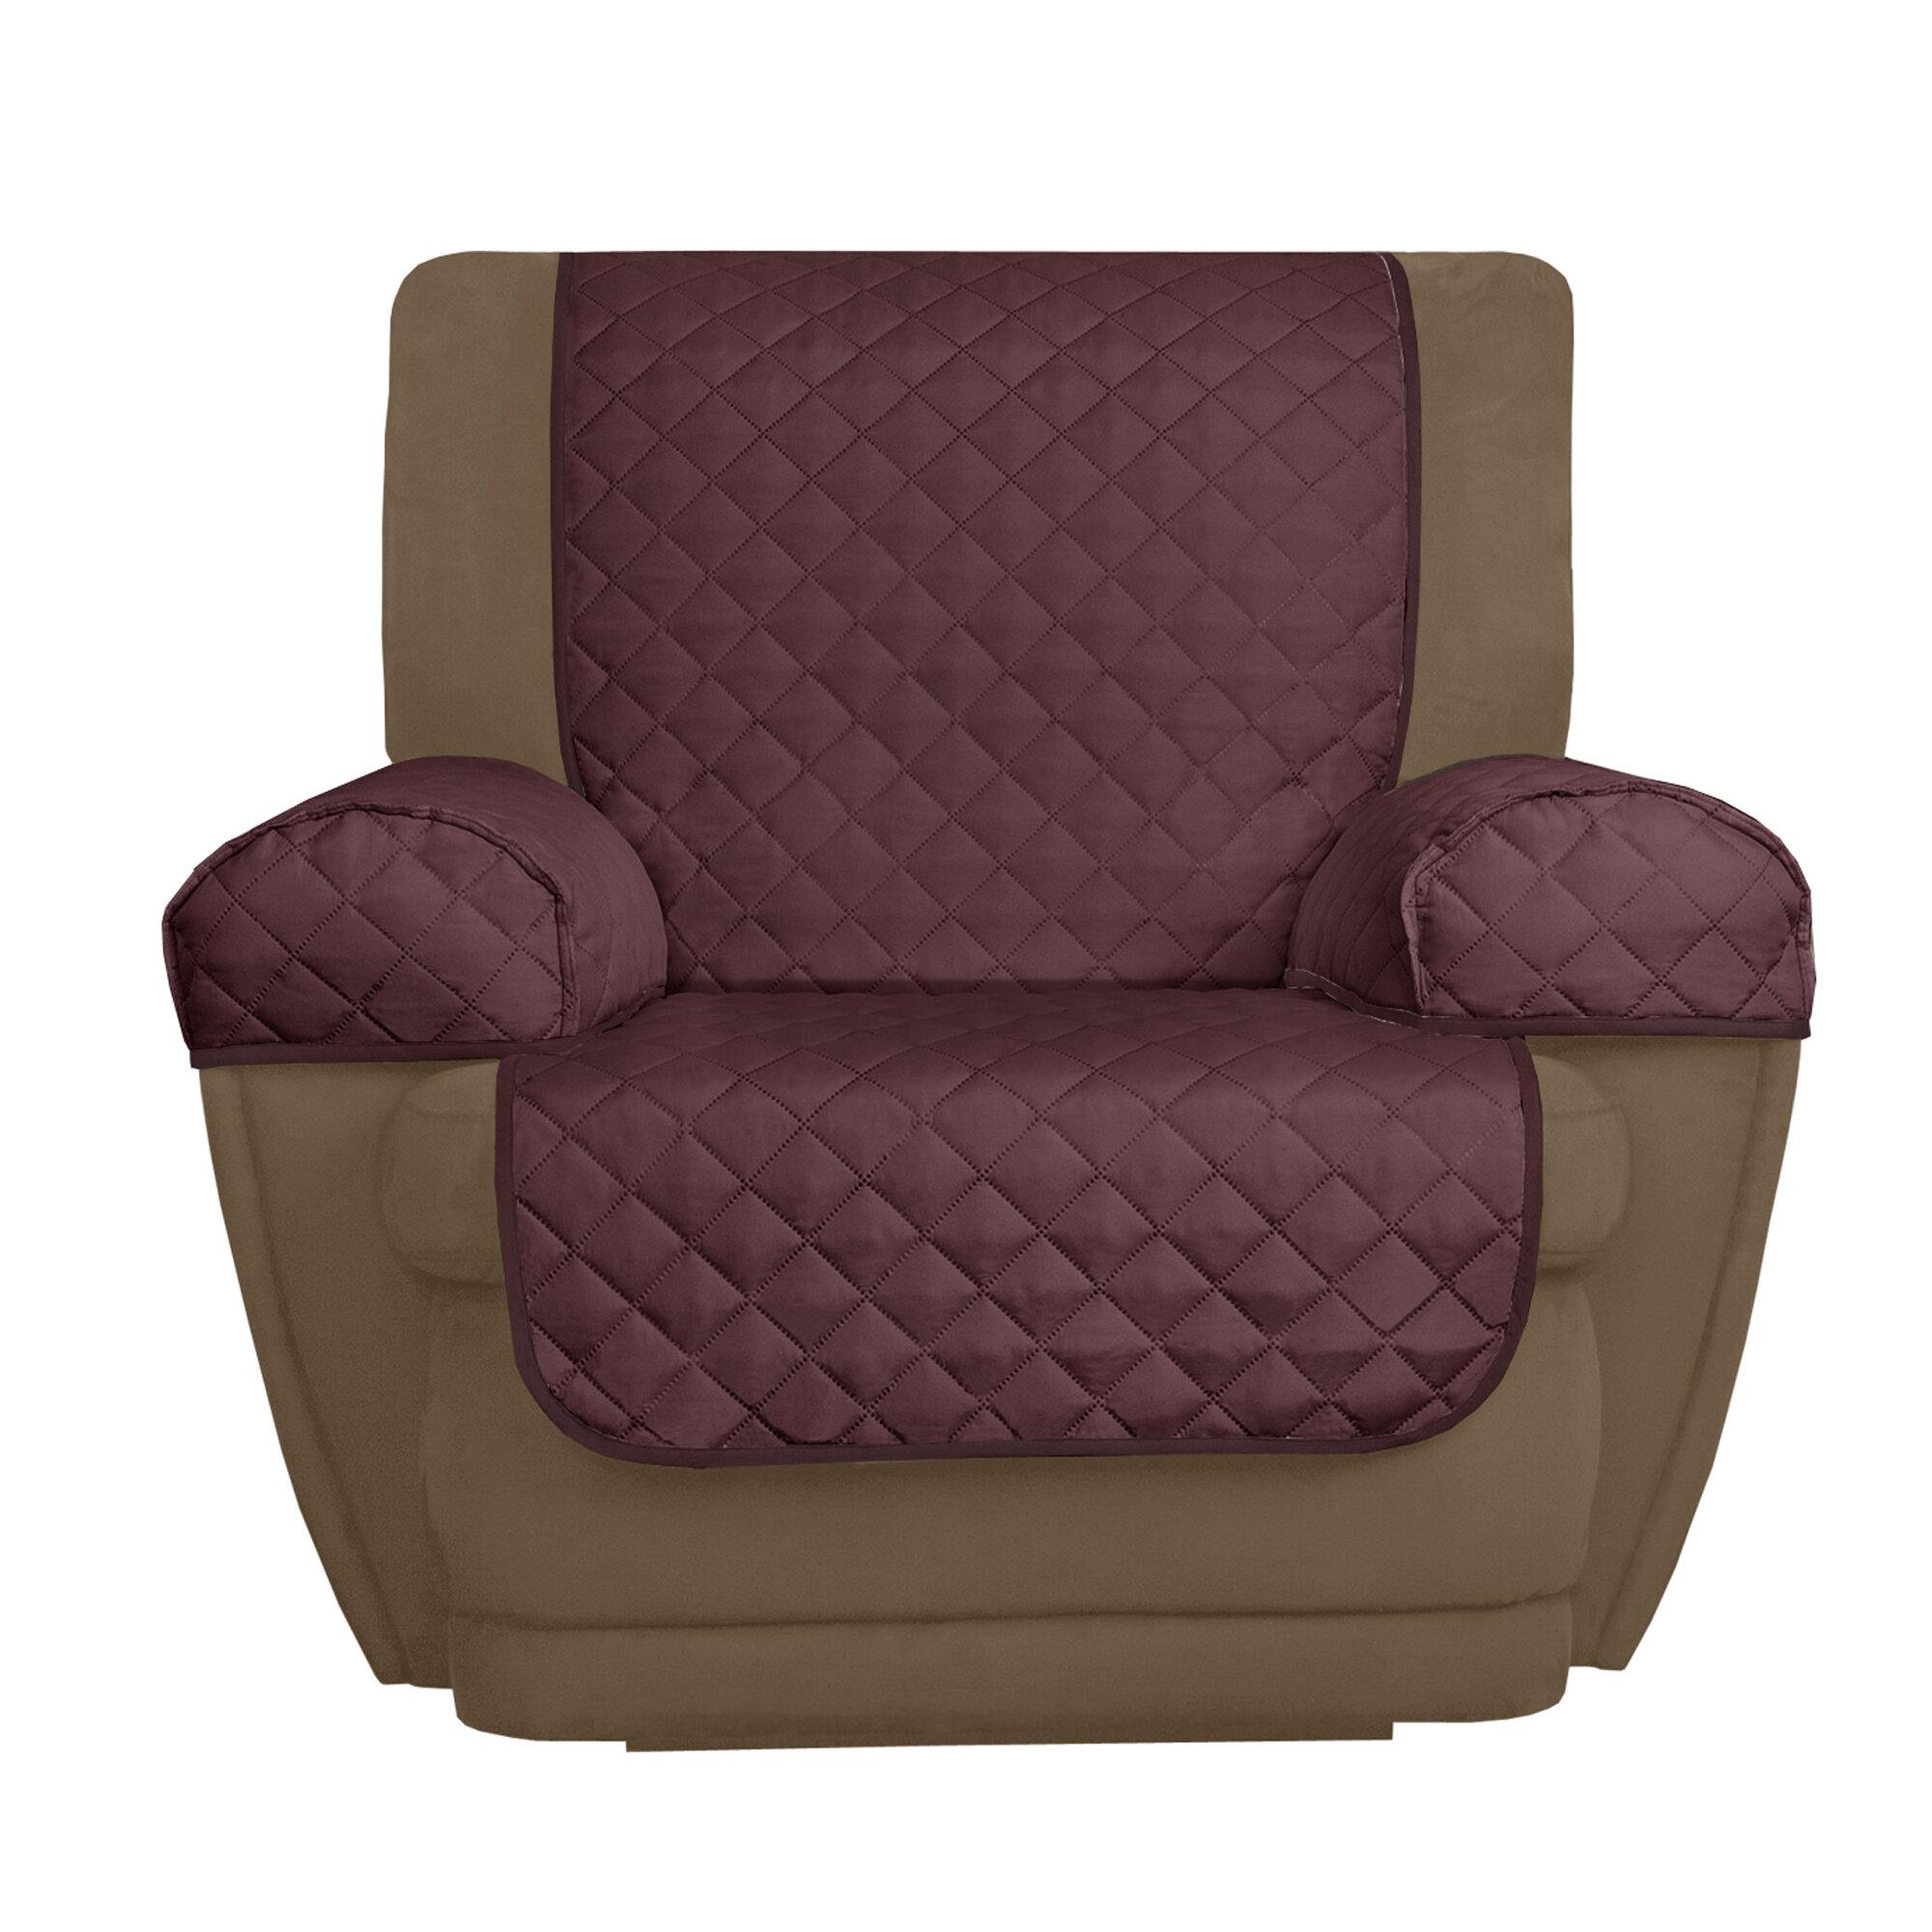 Maytex Buffalo Check T Cushion Recliner Slipcover Wayfair